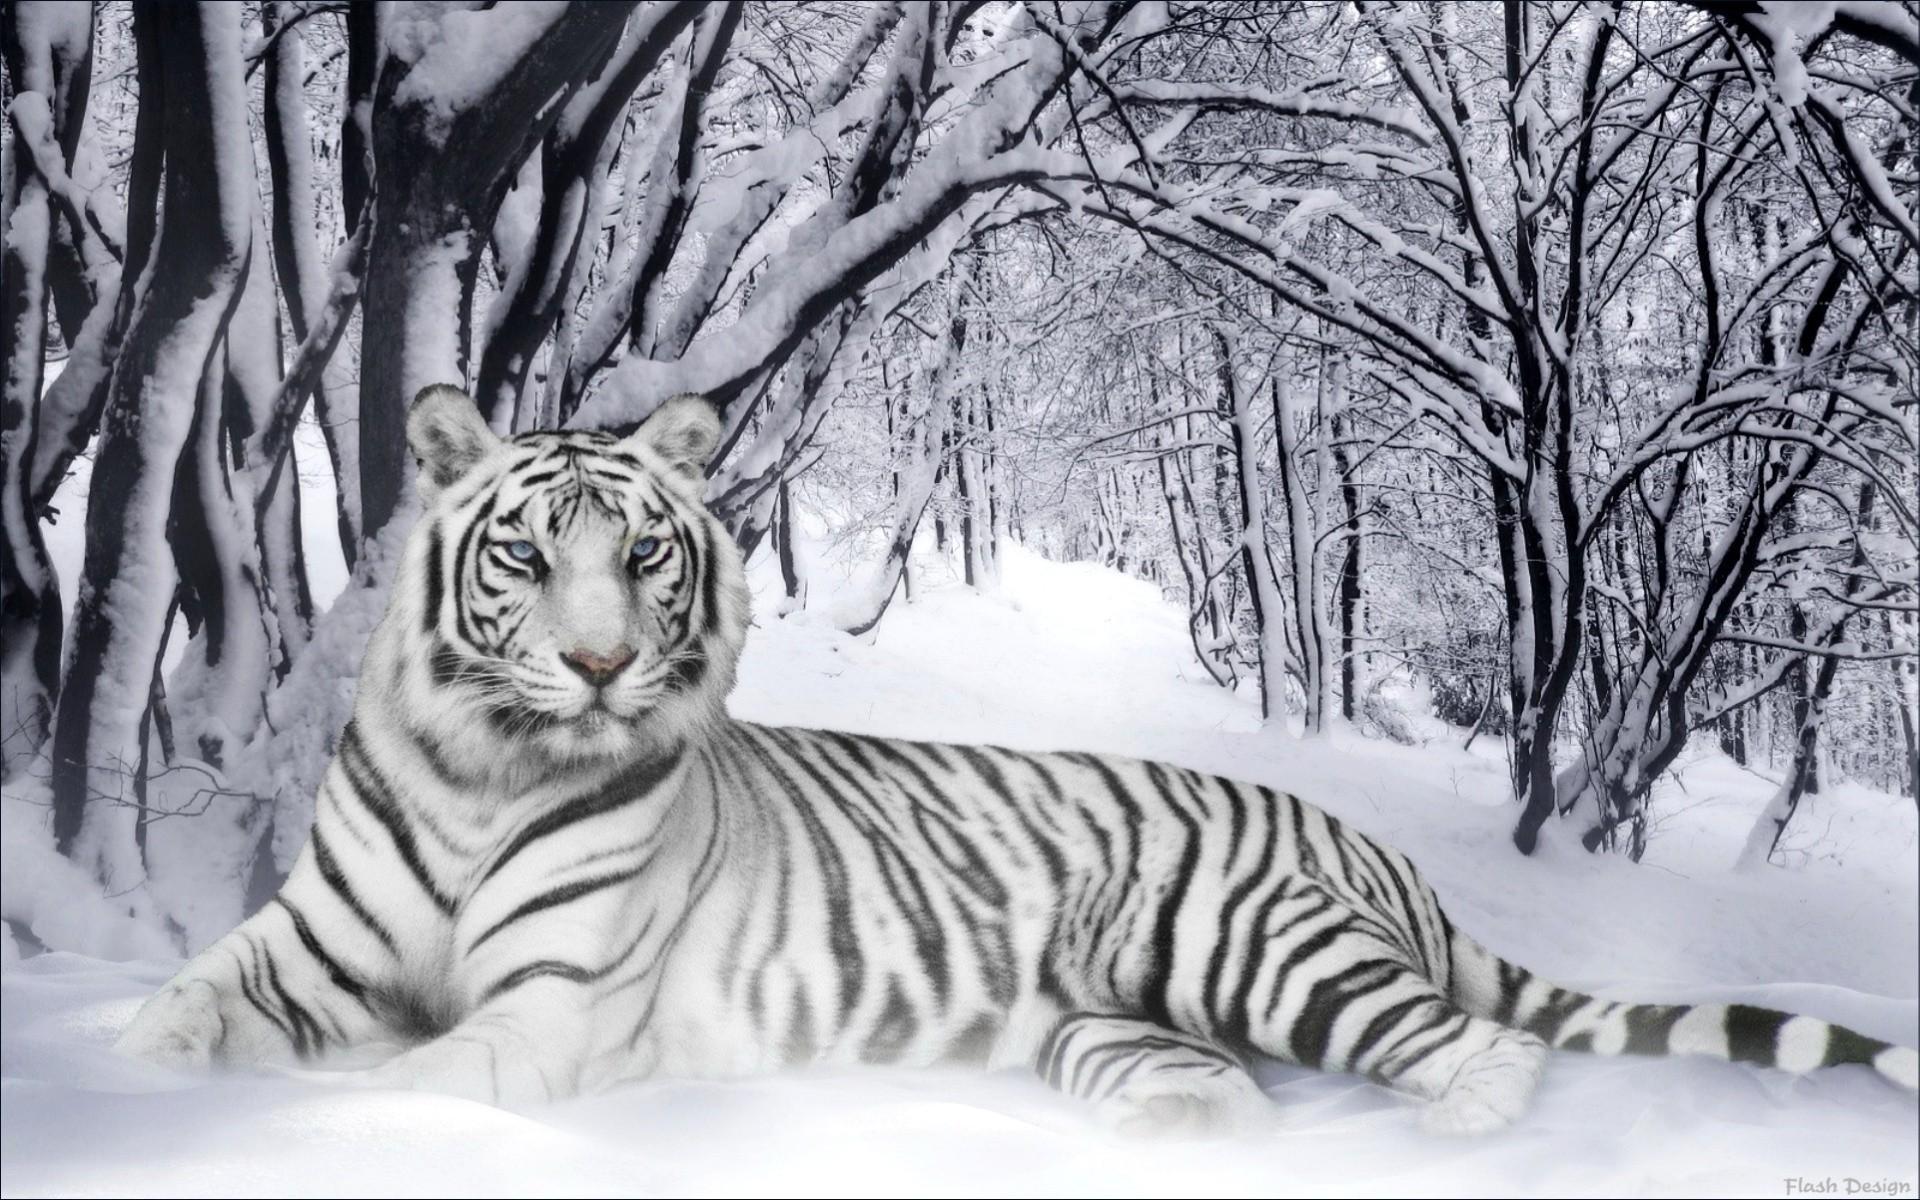 achtergrond screensavers wit tijger wallpaper   ForWallpapercom 1920x1200